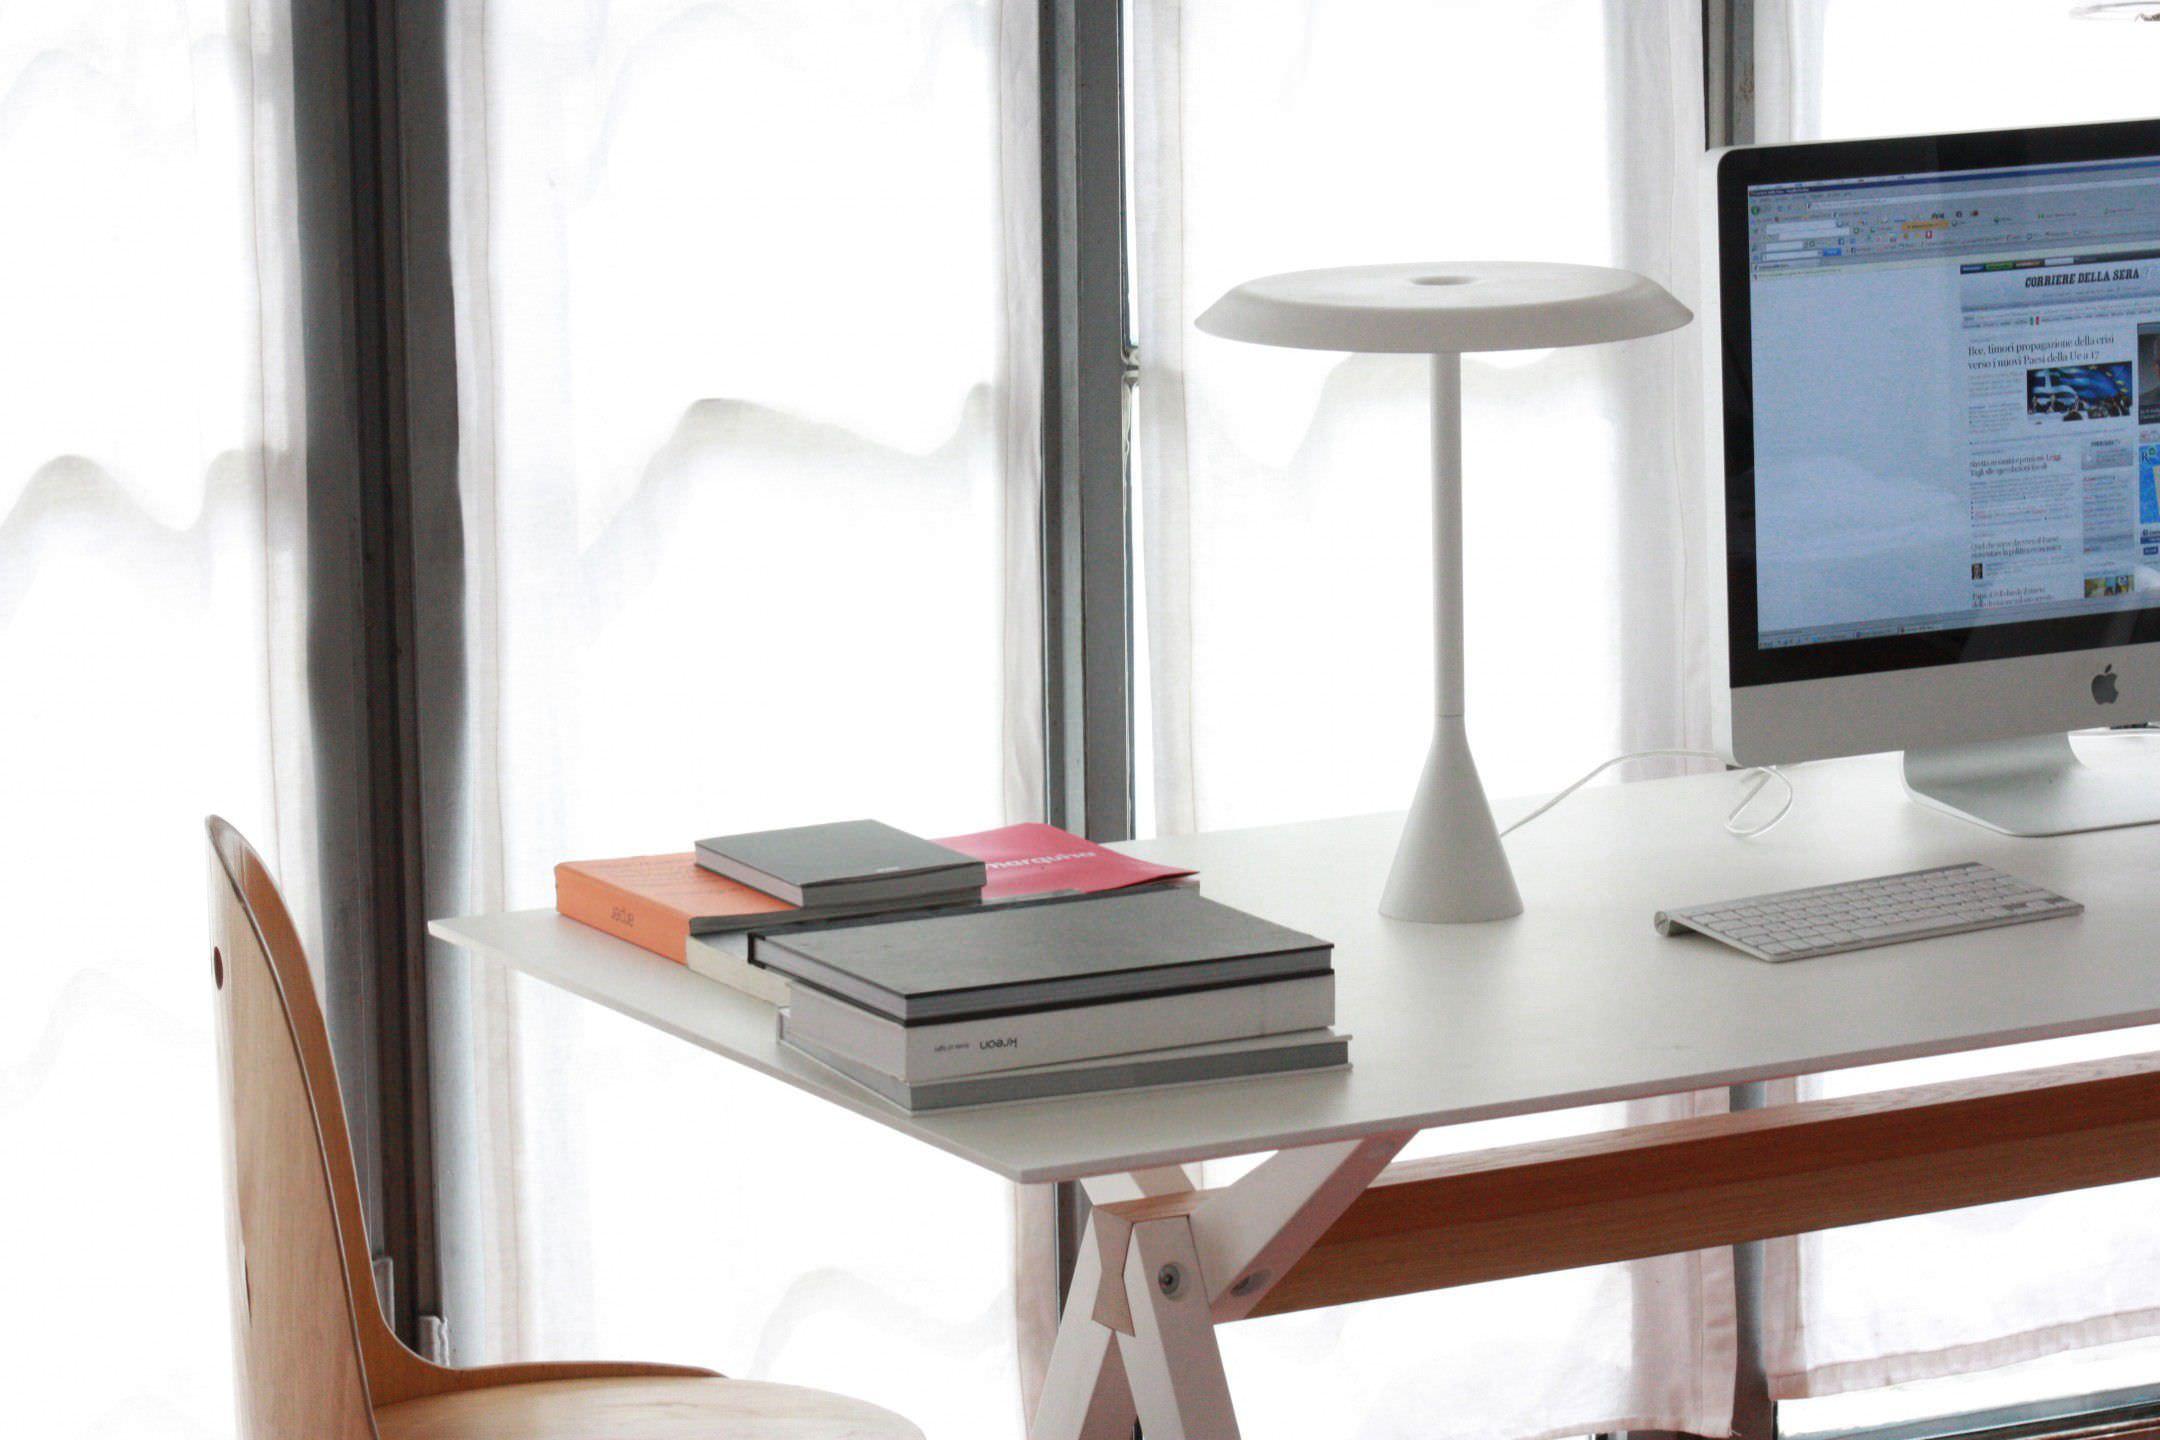 Table lamp original design aluminum polycarbonate PANAMA